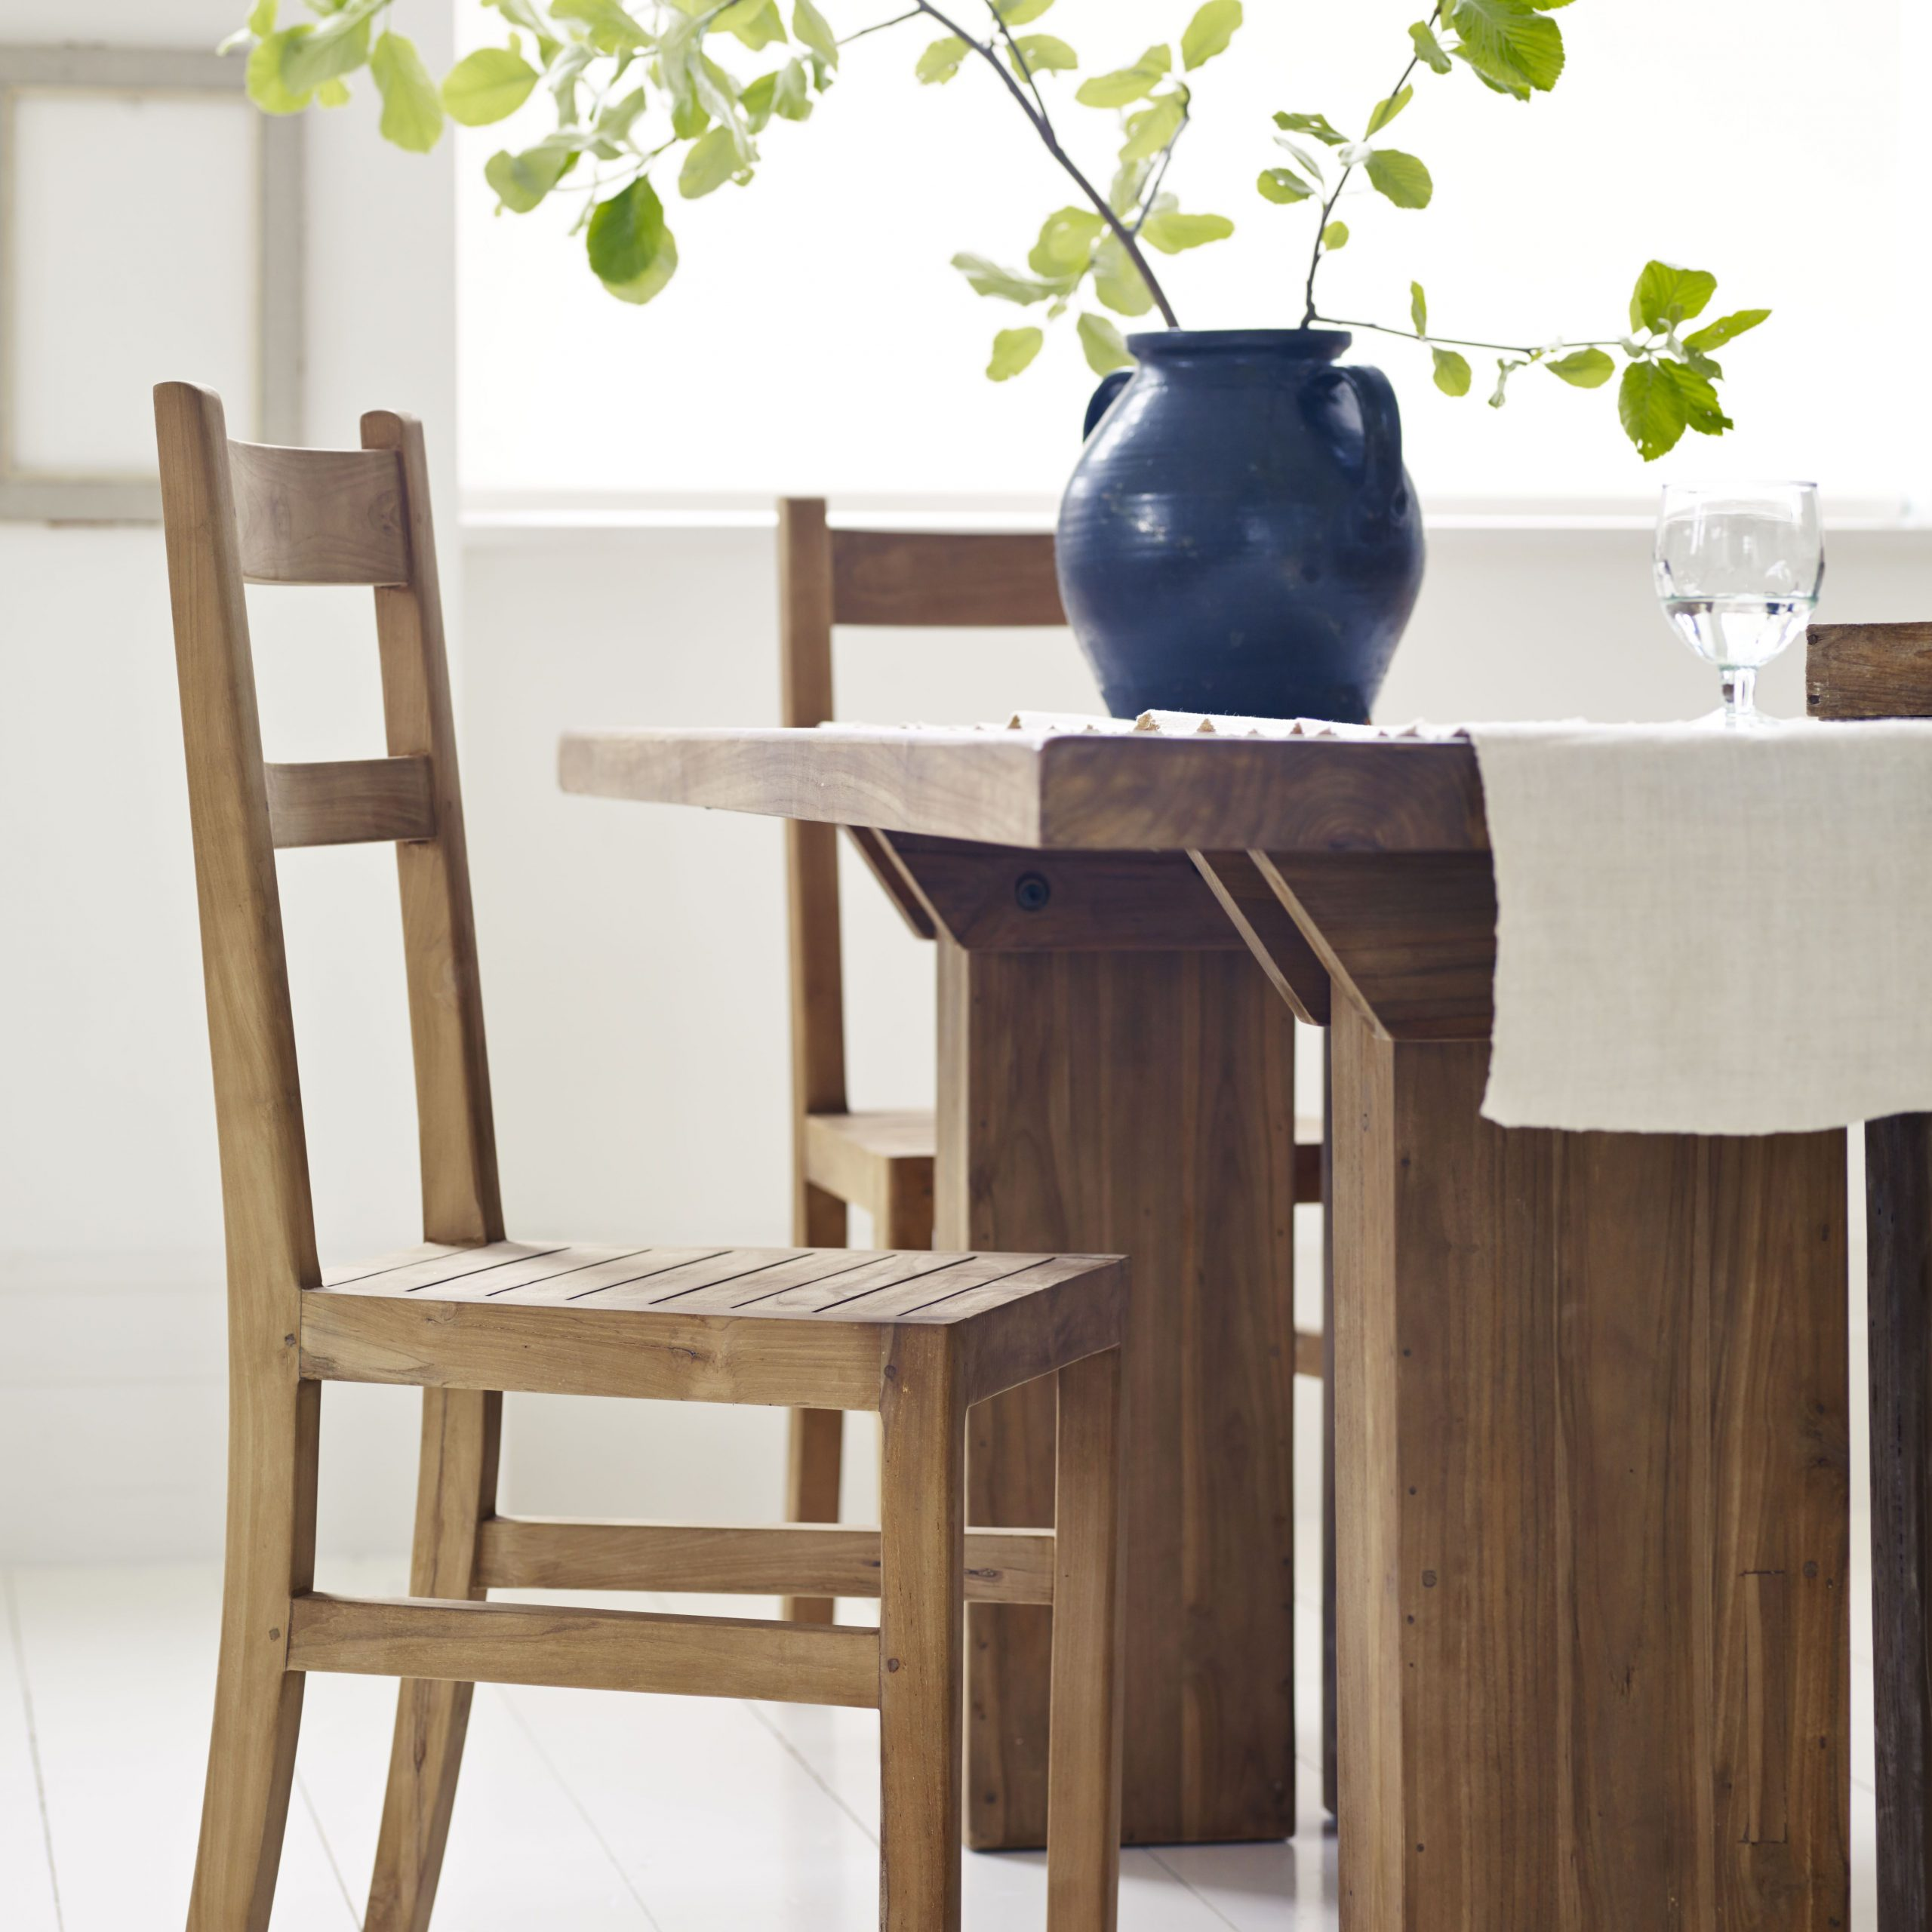 Hampstead Heath Teak Garden Benches In Preferred Tamara Dining Table & Paris Chair – Reclaimed Natural Teak (View 15 of 30)